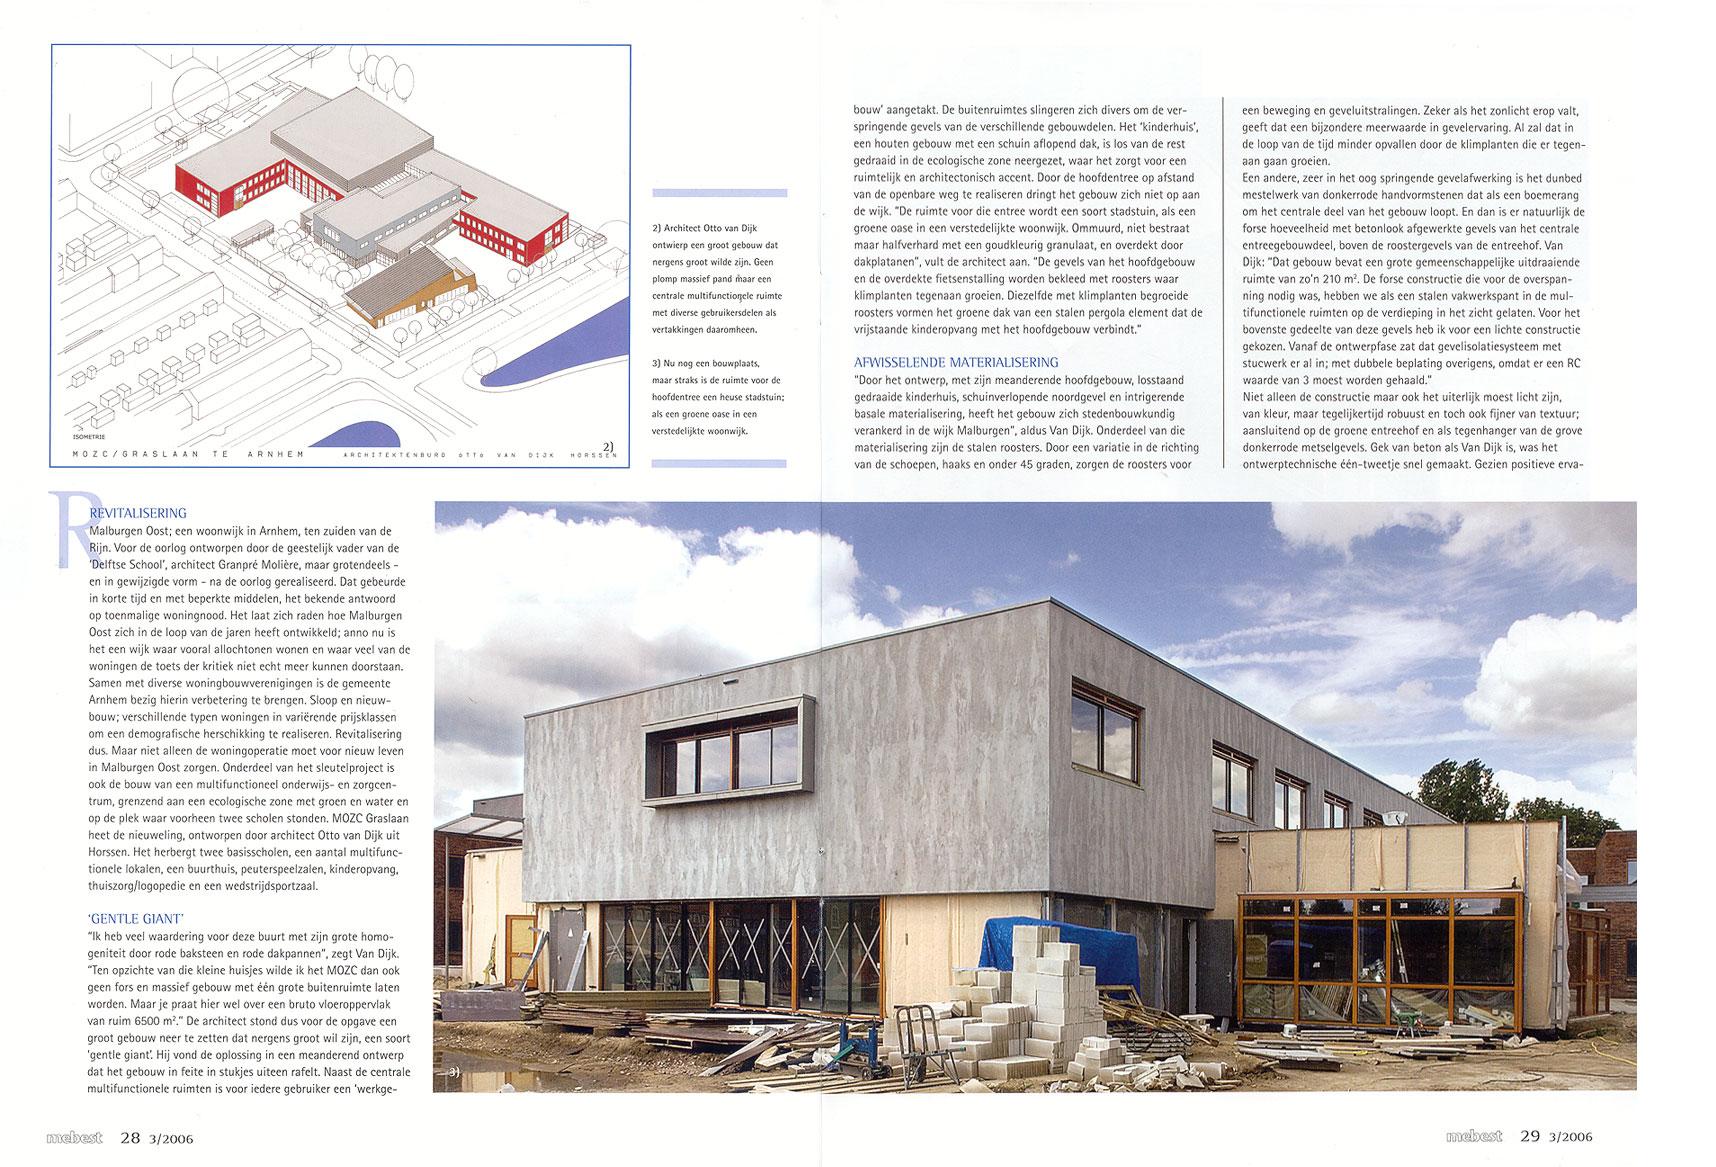 Ruwe bolster, blanke pit, betonlook blz 8 en 9